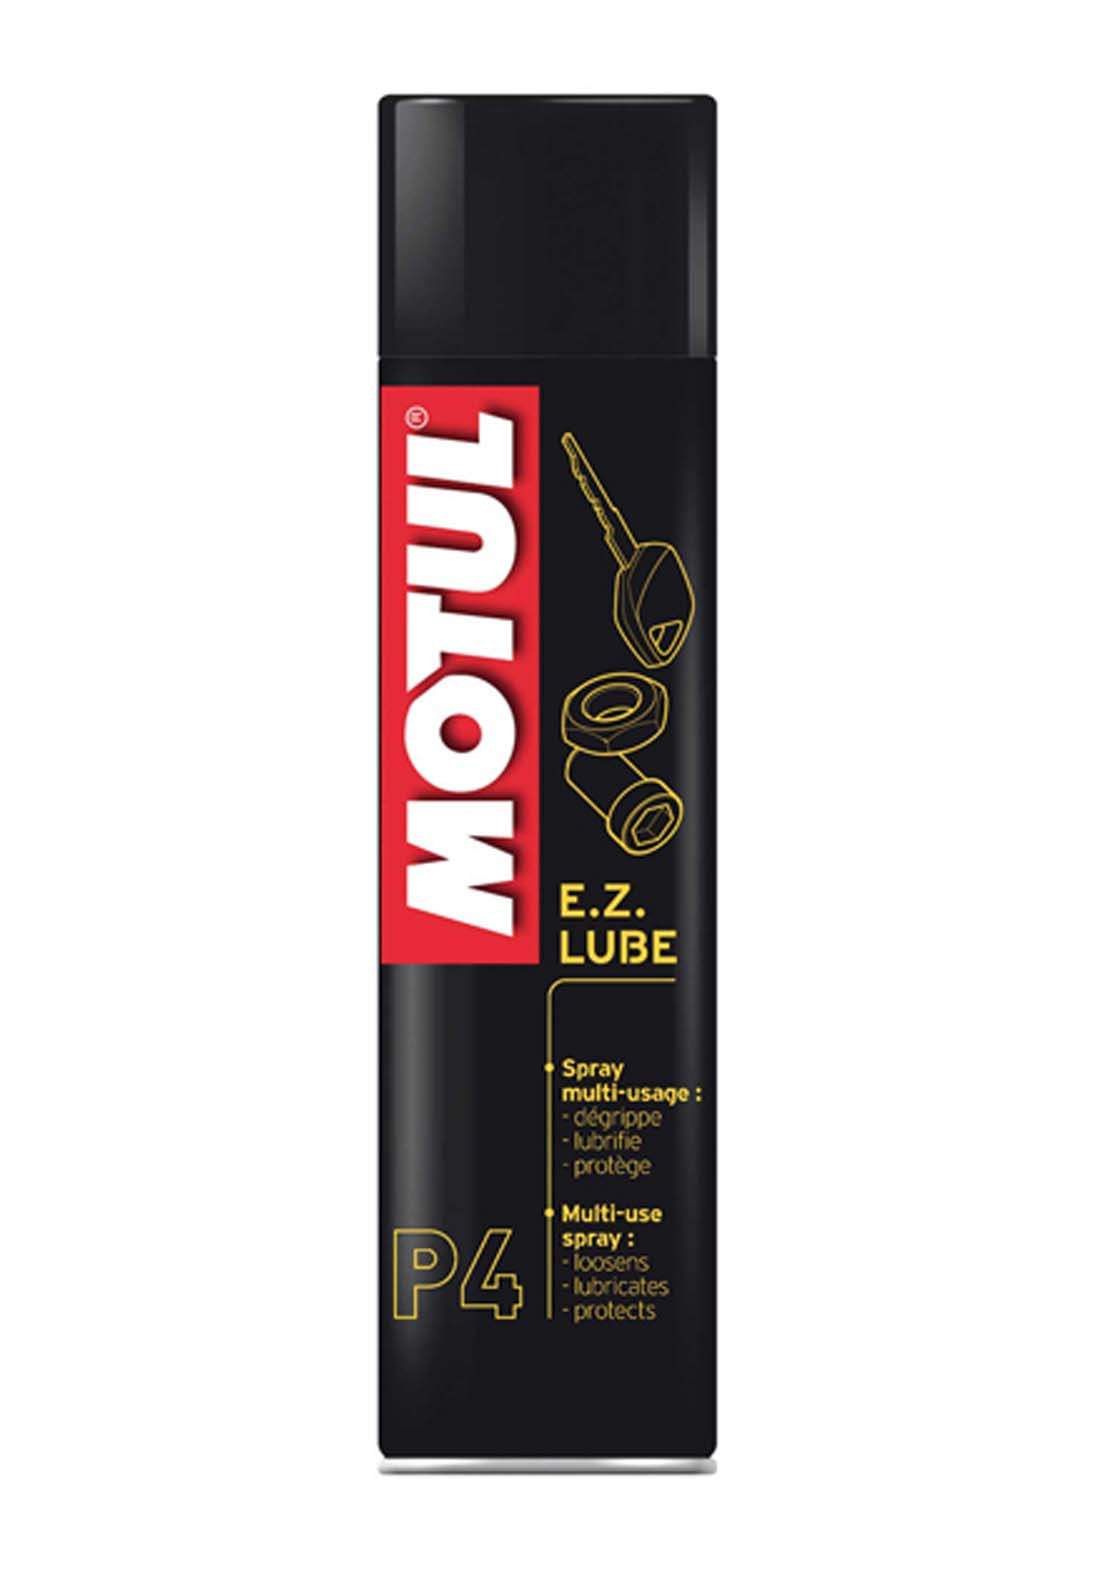 Motul P4 E Z Lube Multi-Purpose Fluid Lubricant  400ml زيت تشحيم متعدد الحماية للدراجات النارية